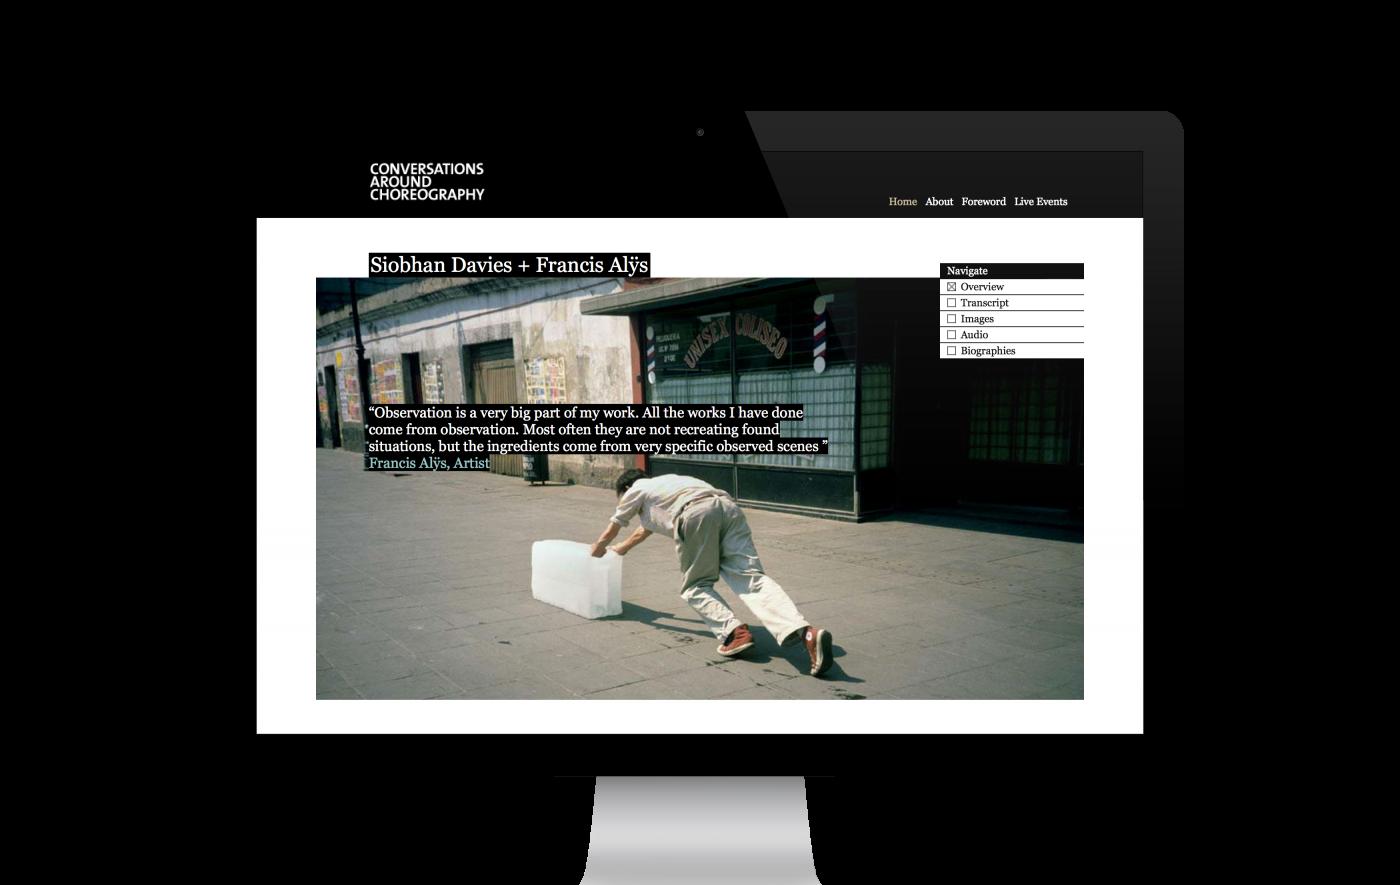 Conversations Around Choreography microsite for Siobhan Davies Dance - www.siobhandavies.com/conversations/